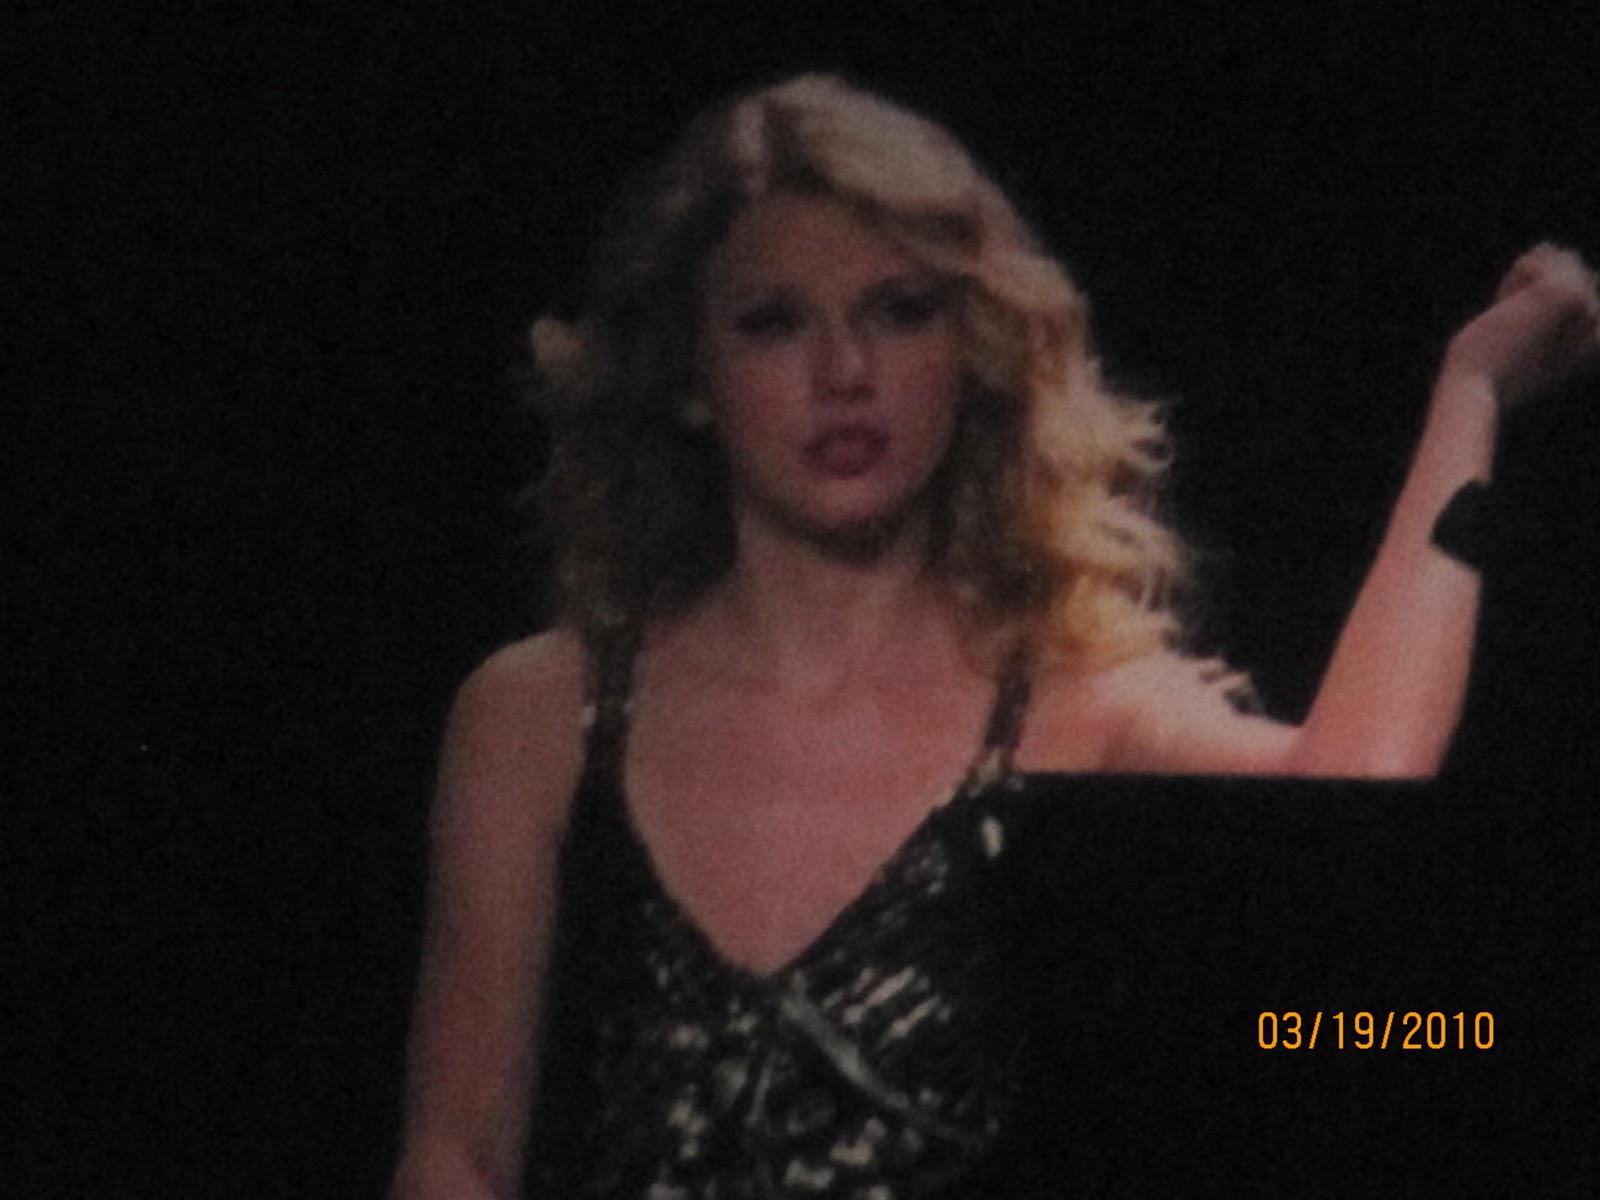 http://1.bp.blogspot.com/_zhQCIcpuWno/TMzwfbDWu0I/AAAAAAAAAtA/KR7Hn2u8cX0/s1600/Taylor+Swift+Concert+198.jpg